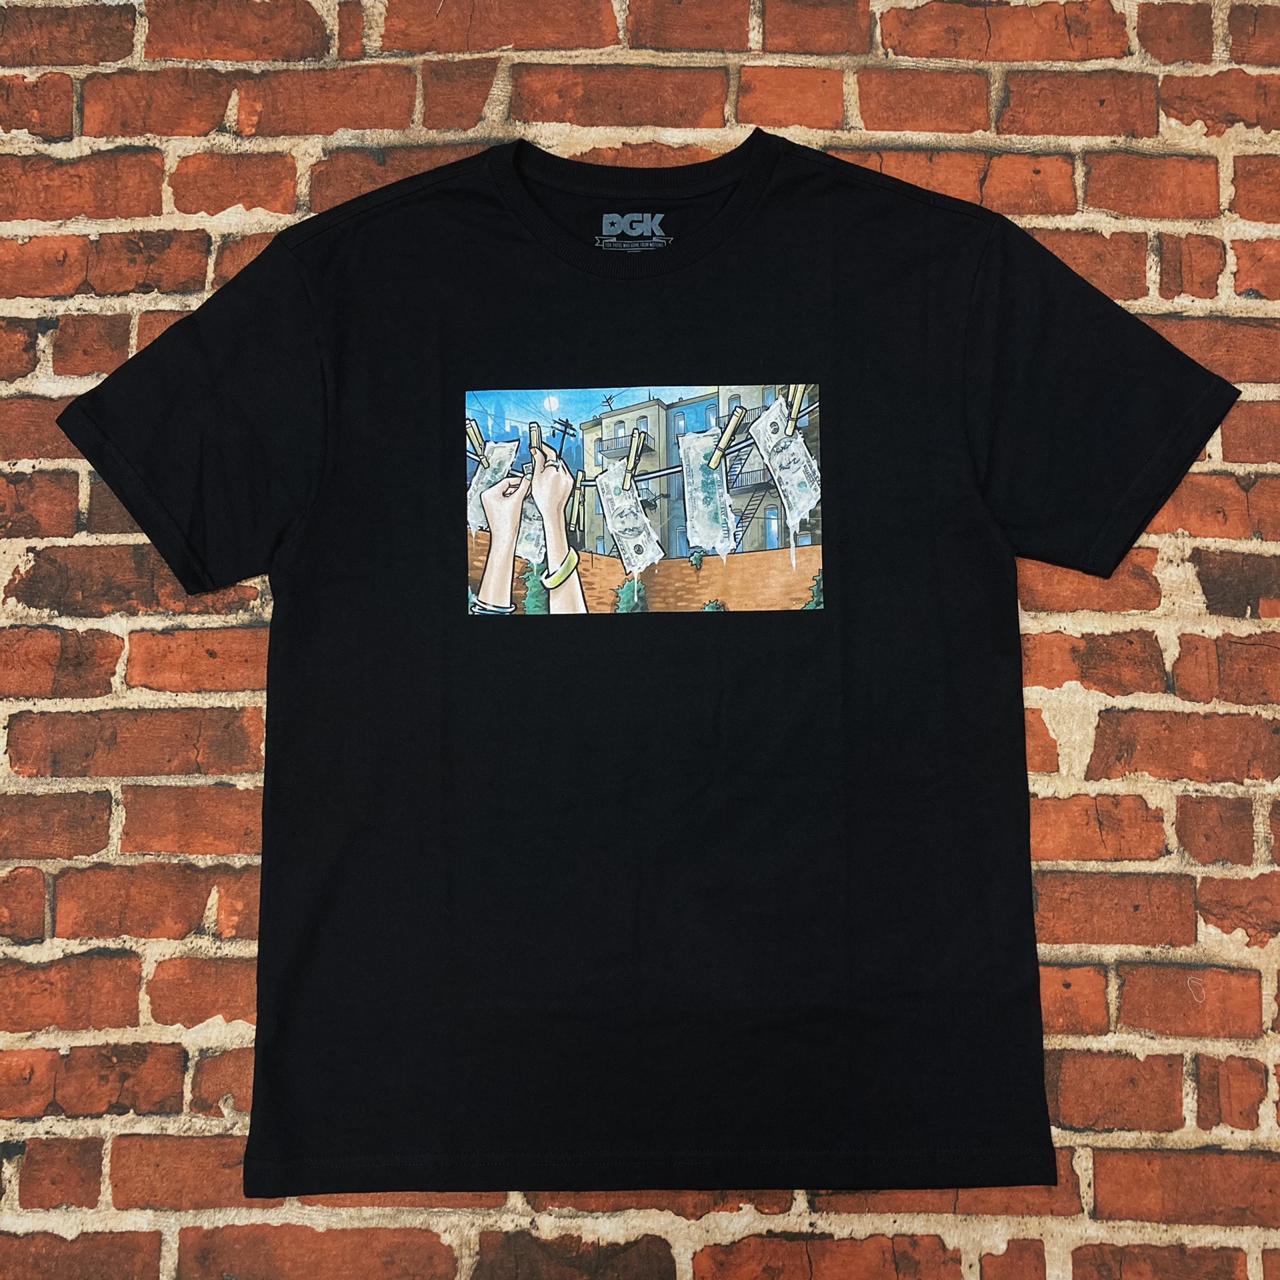 Camiseta dgk loundry black